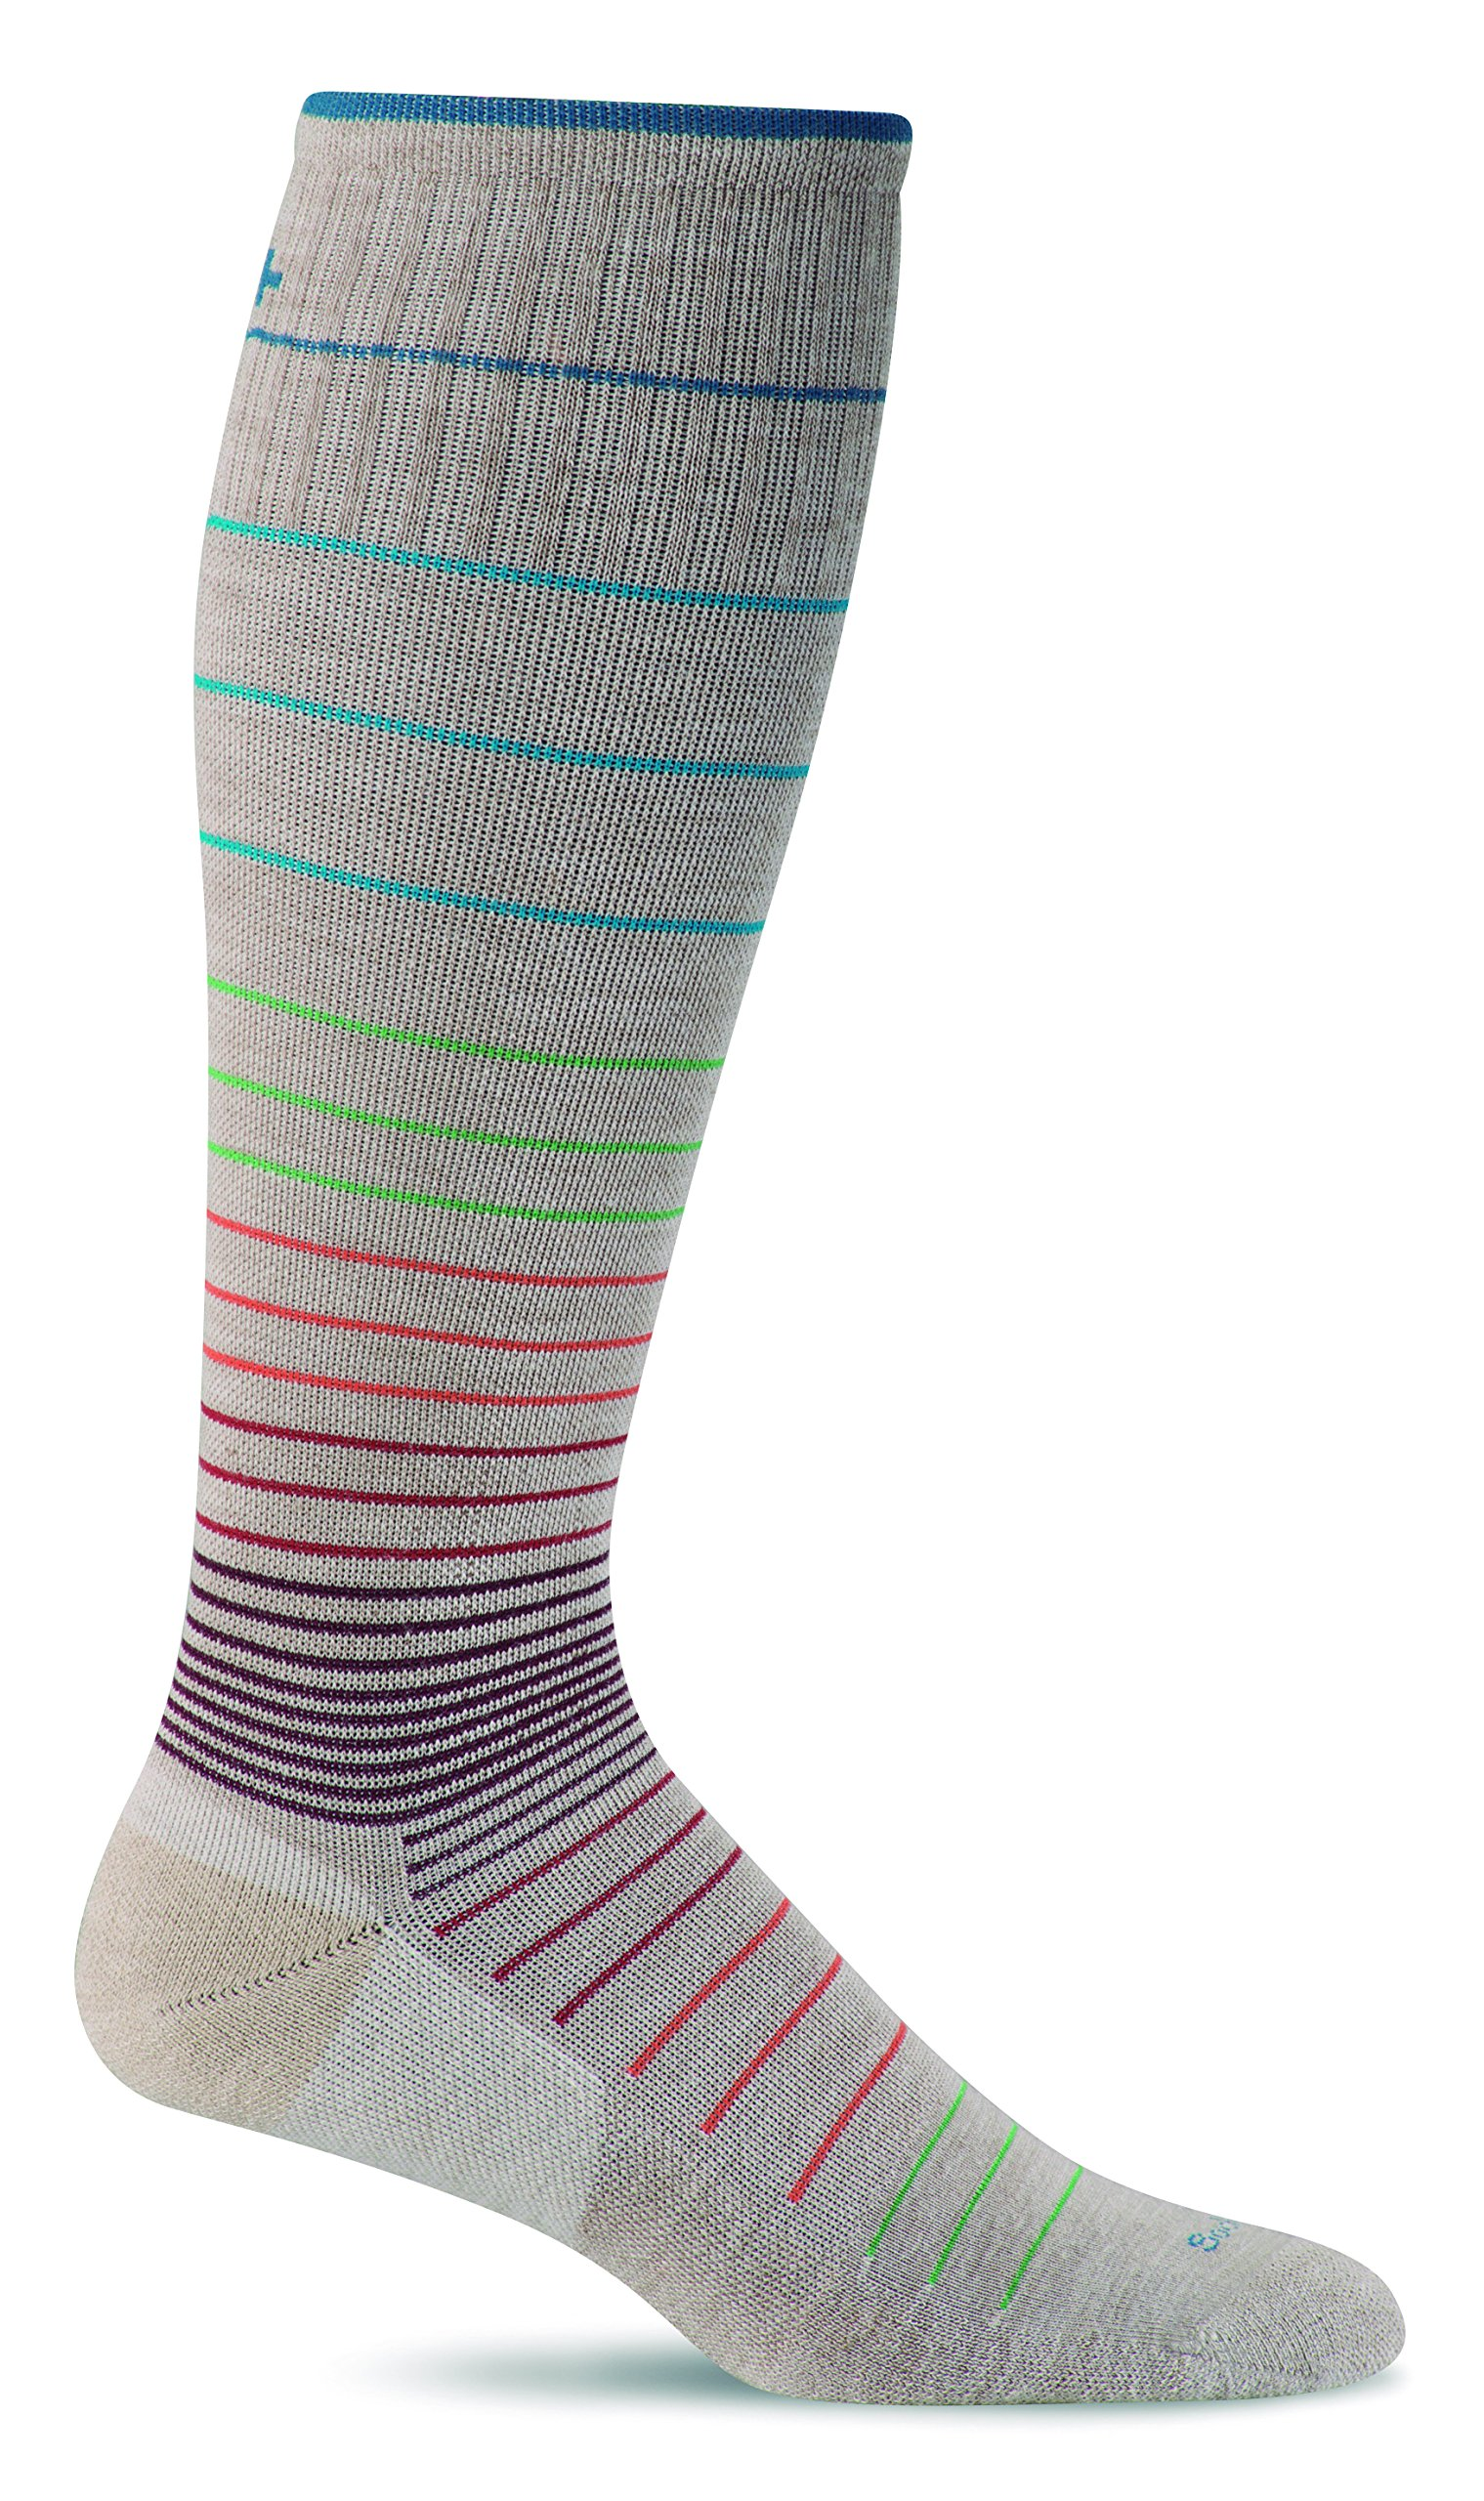 Sockwell Women's Circulator Graduated Compression Socks, Small/Medium (4-7.5), Barley